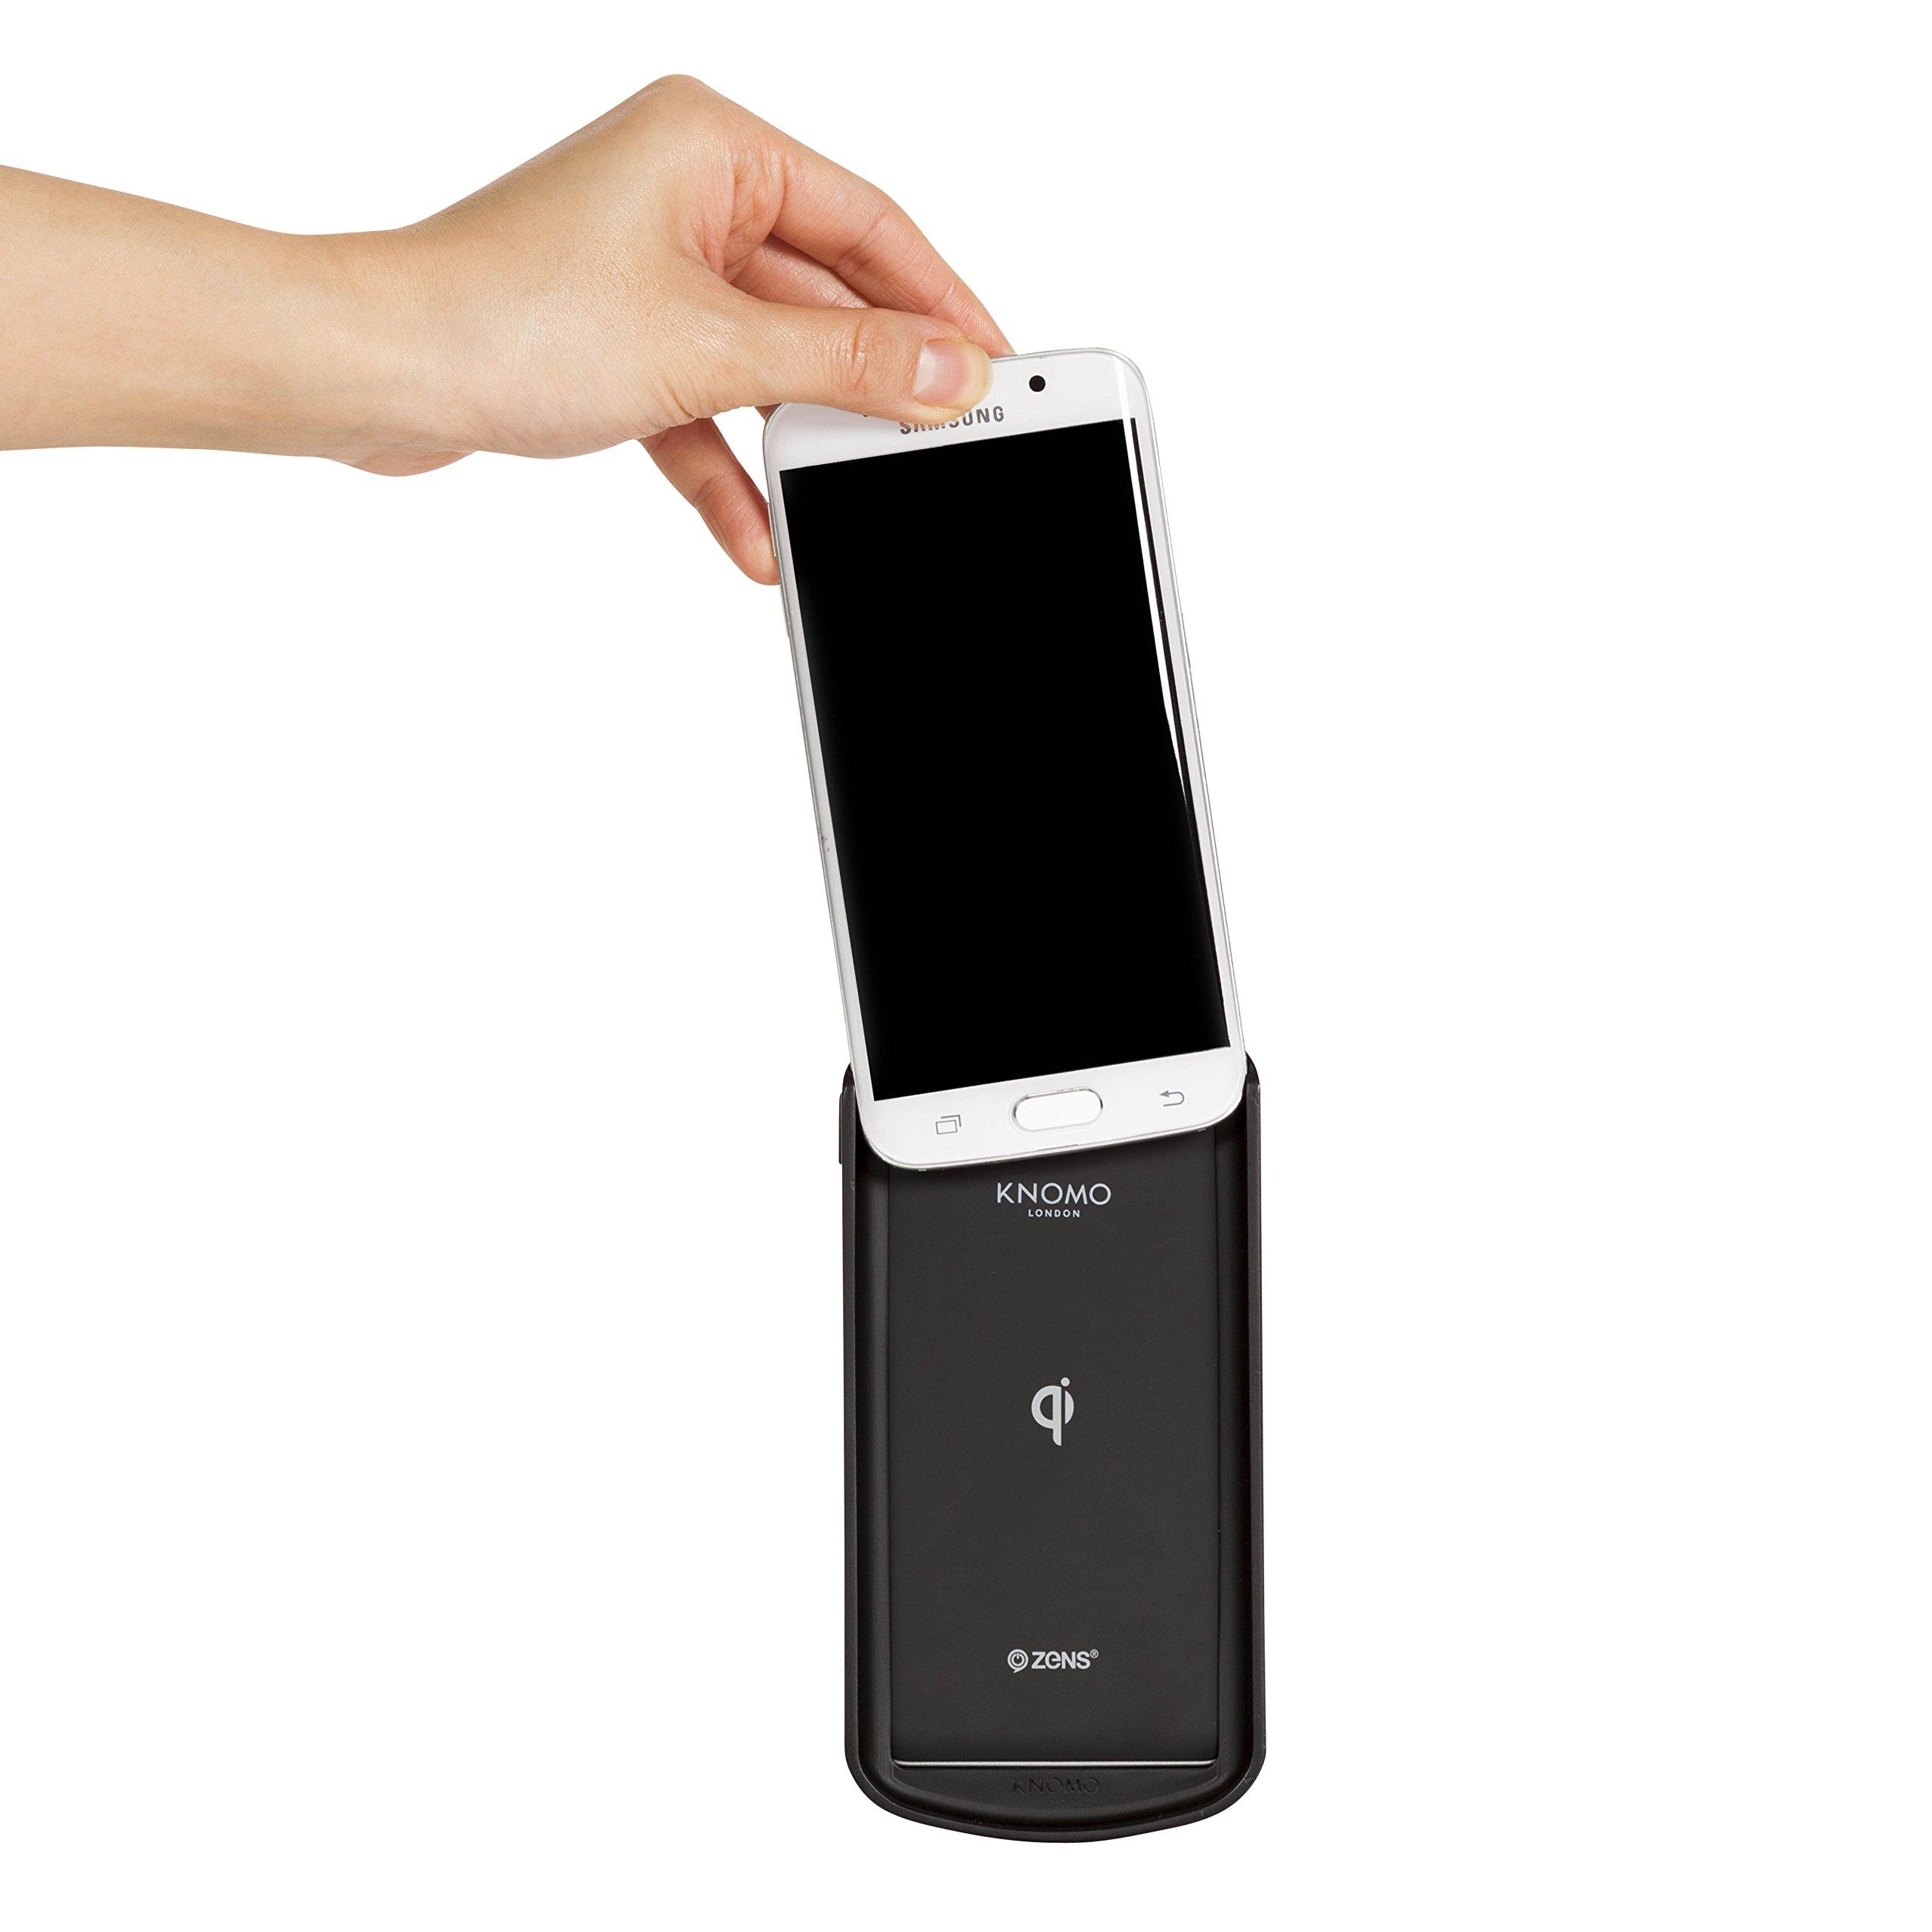 KNOMO DropGo Wireless Power Bank